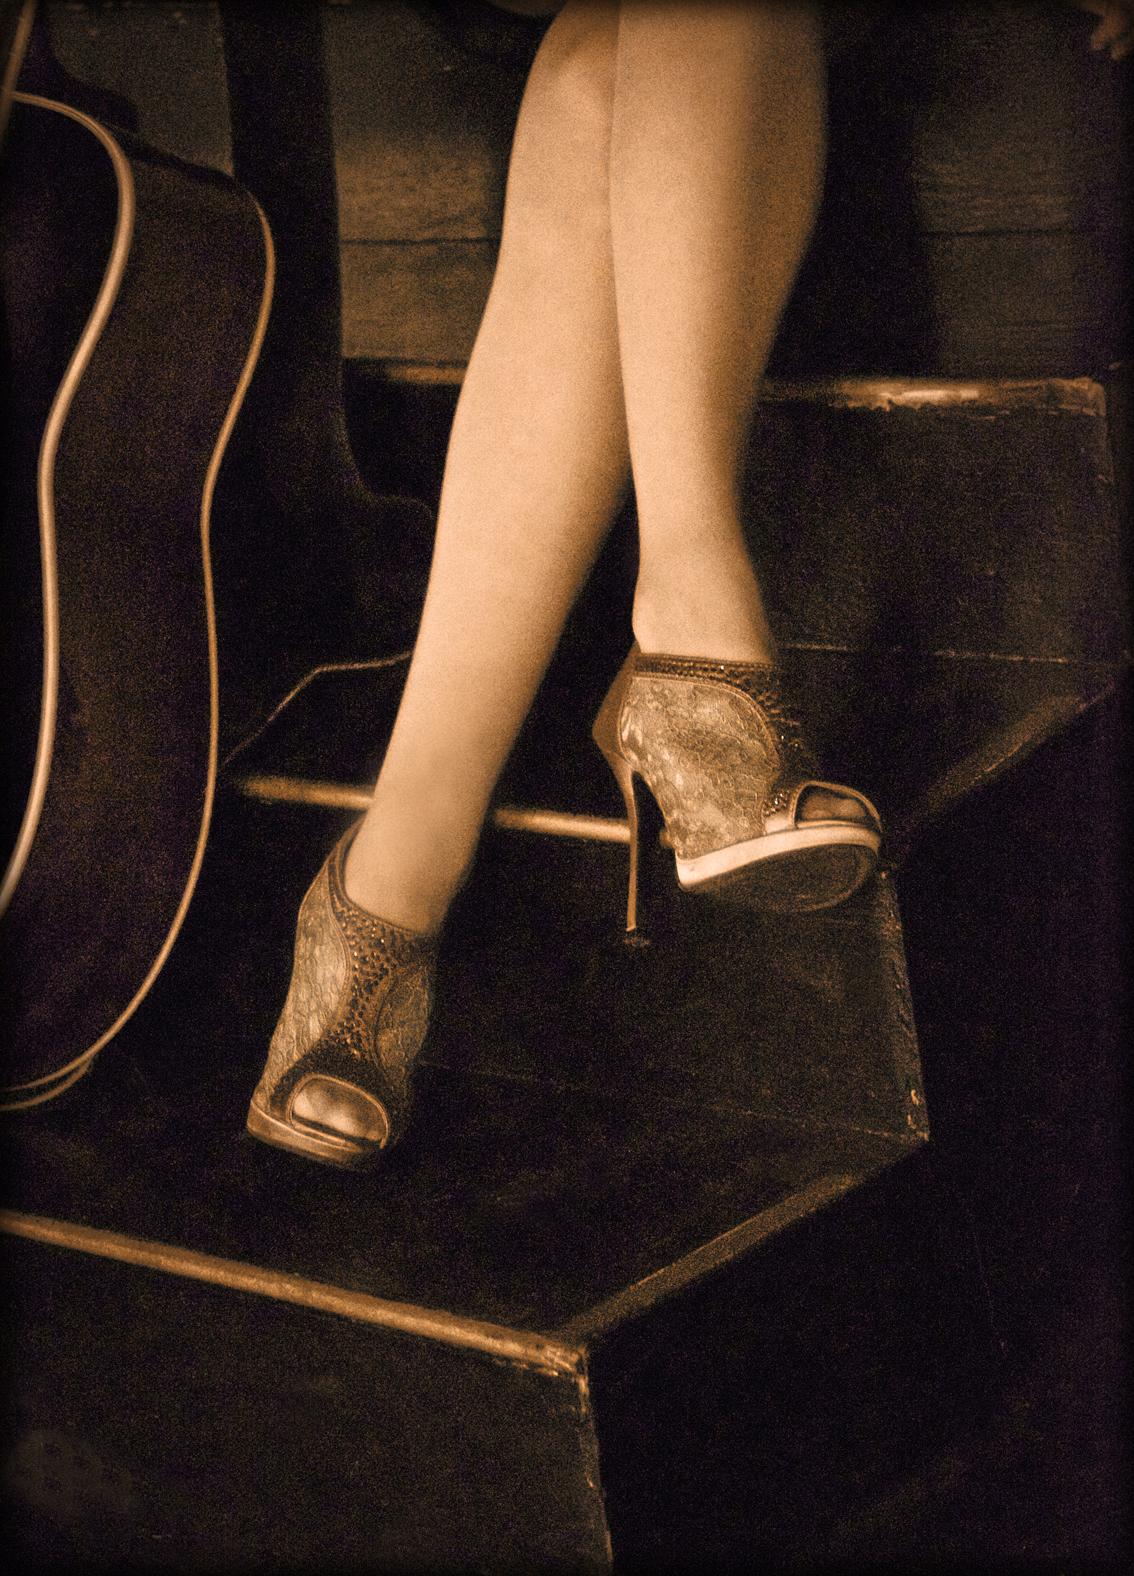 Kress Heels by Mary 2012.jpg